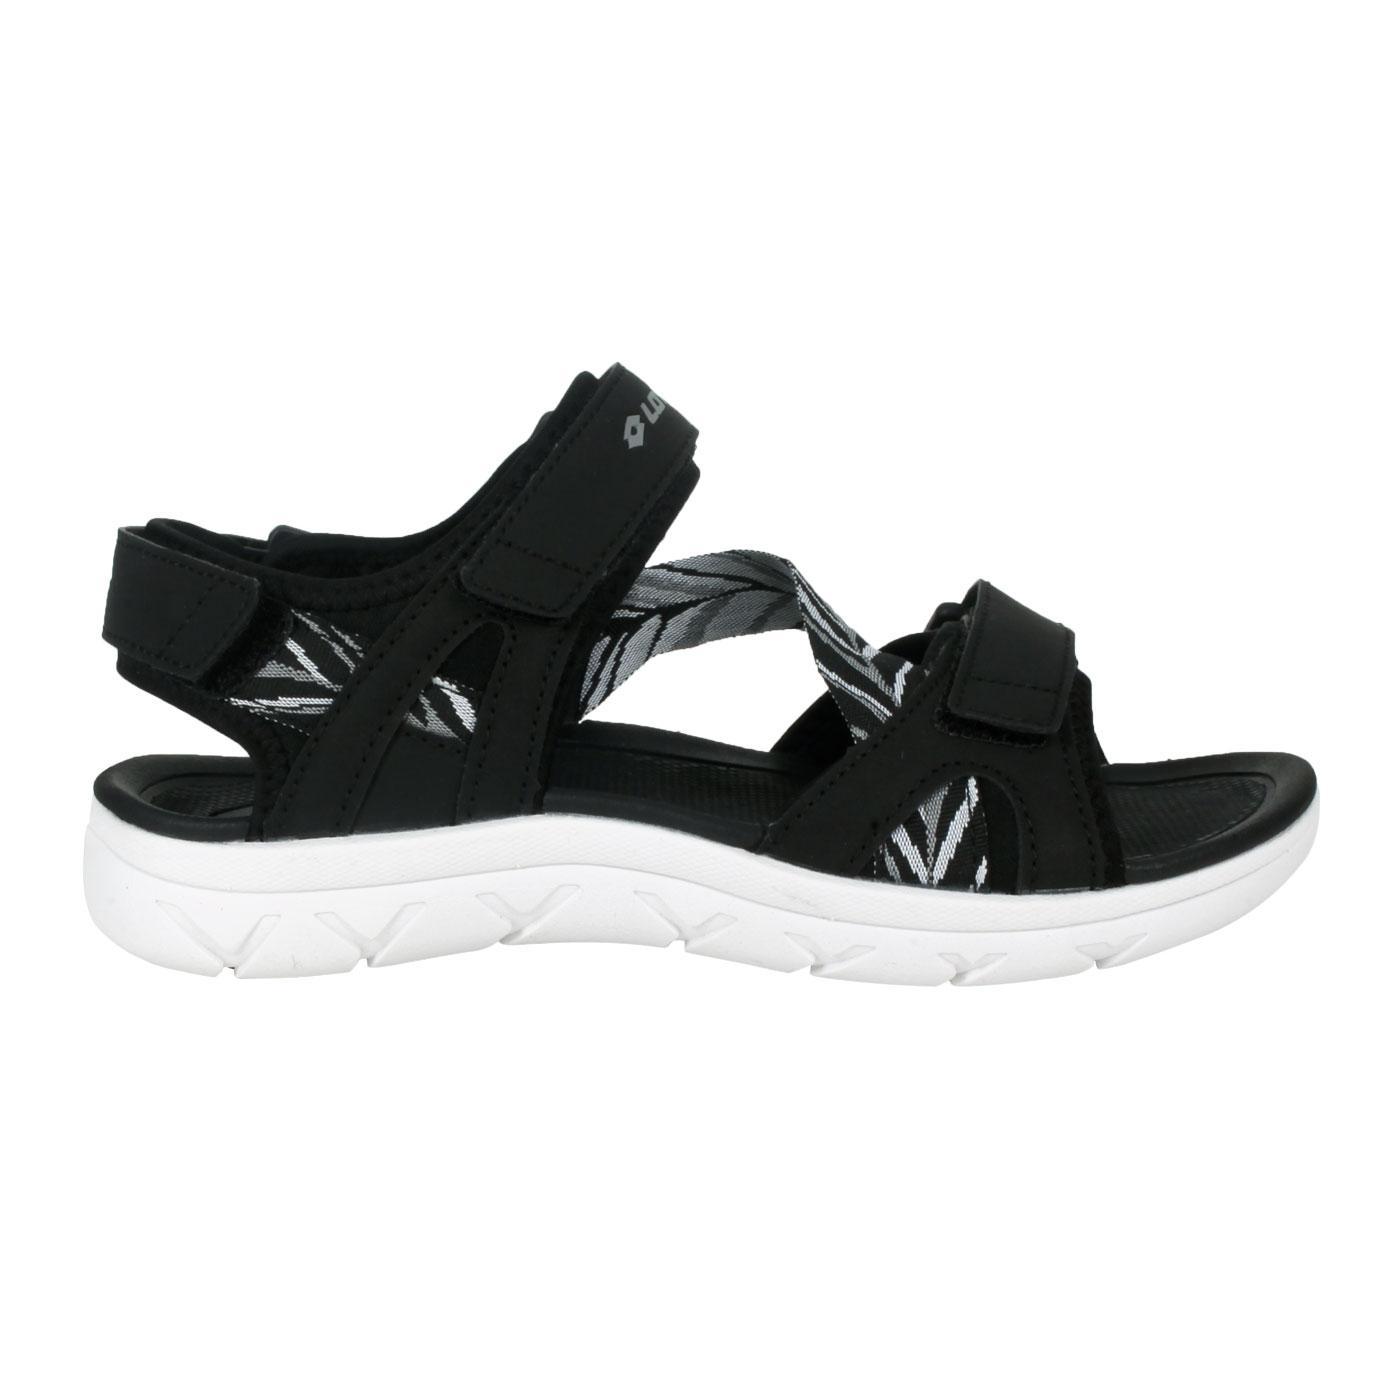 LOTTO 女款圖紋織帶涼鞋 LT1AWS3360 - 黑白